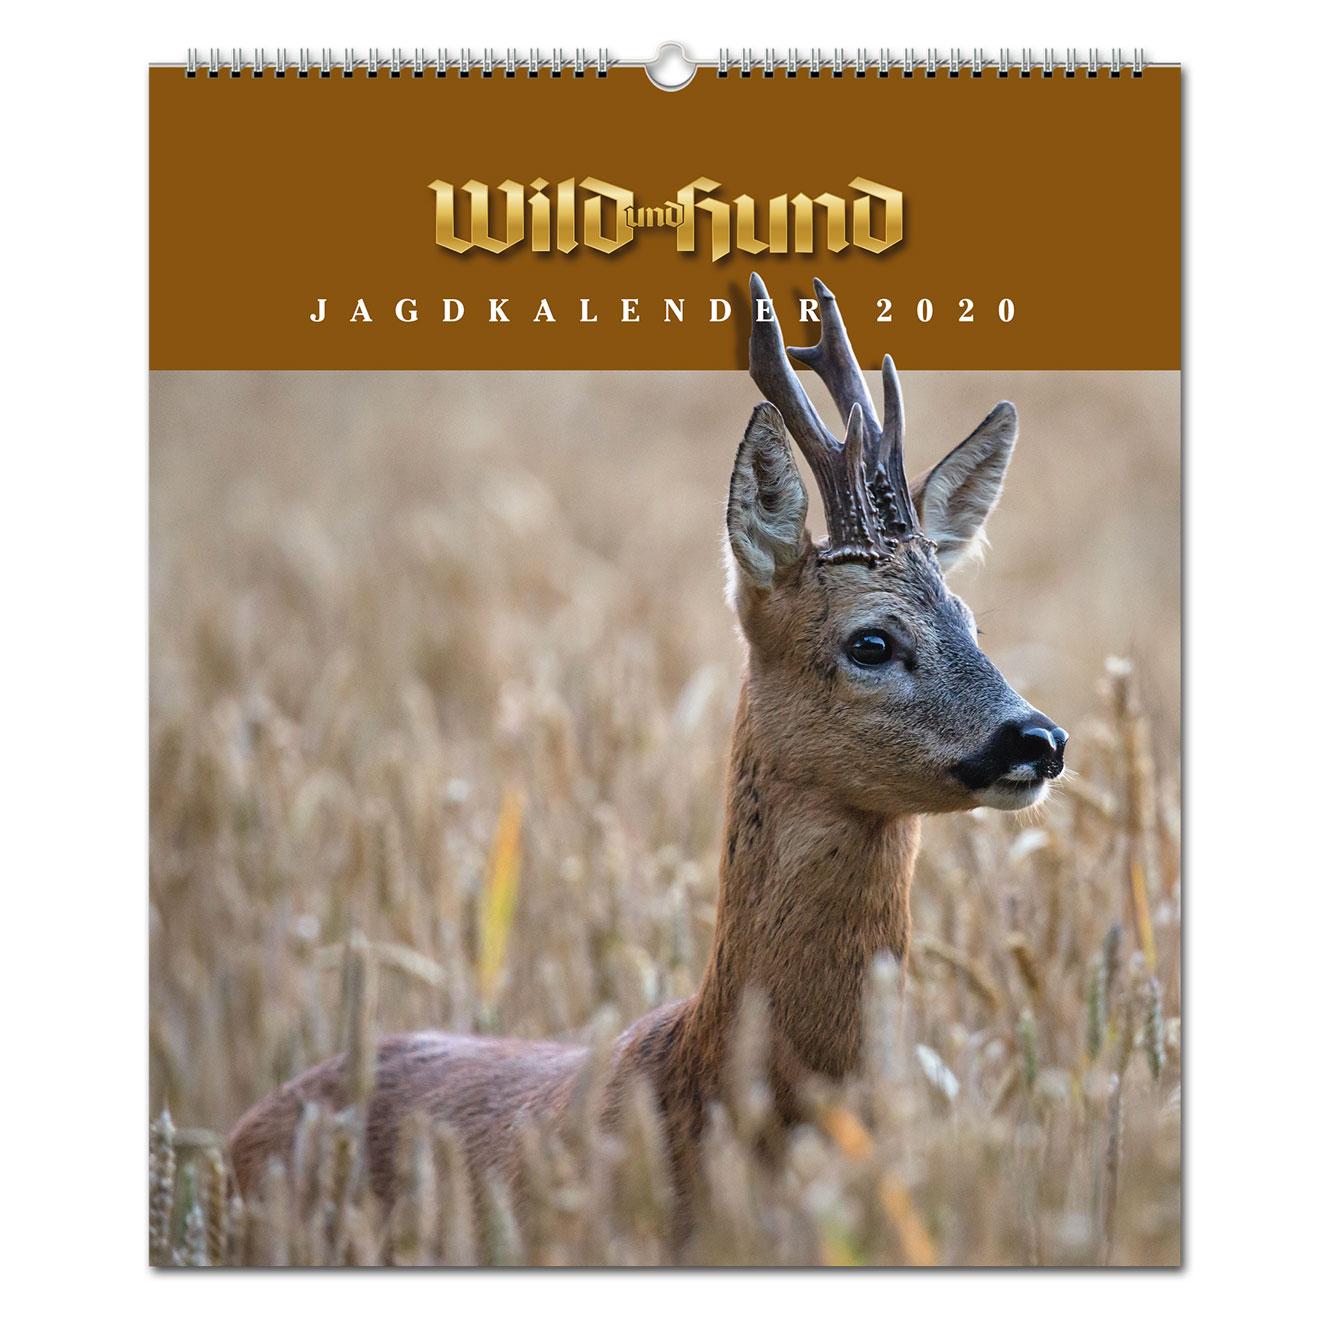 ebf8c440f700ff WILD UND HUND Edition: Jagdkalender Wandvariante 2020 - Pareyshop.de